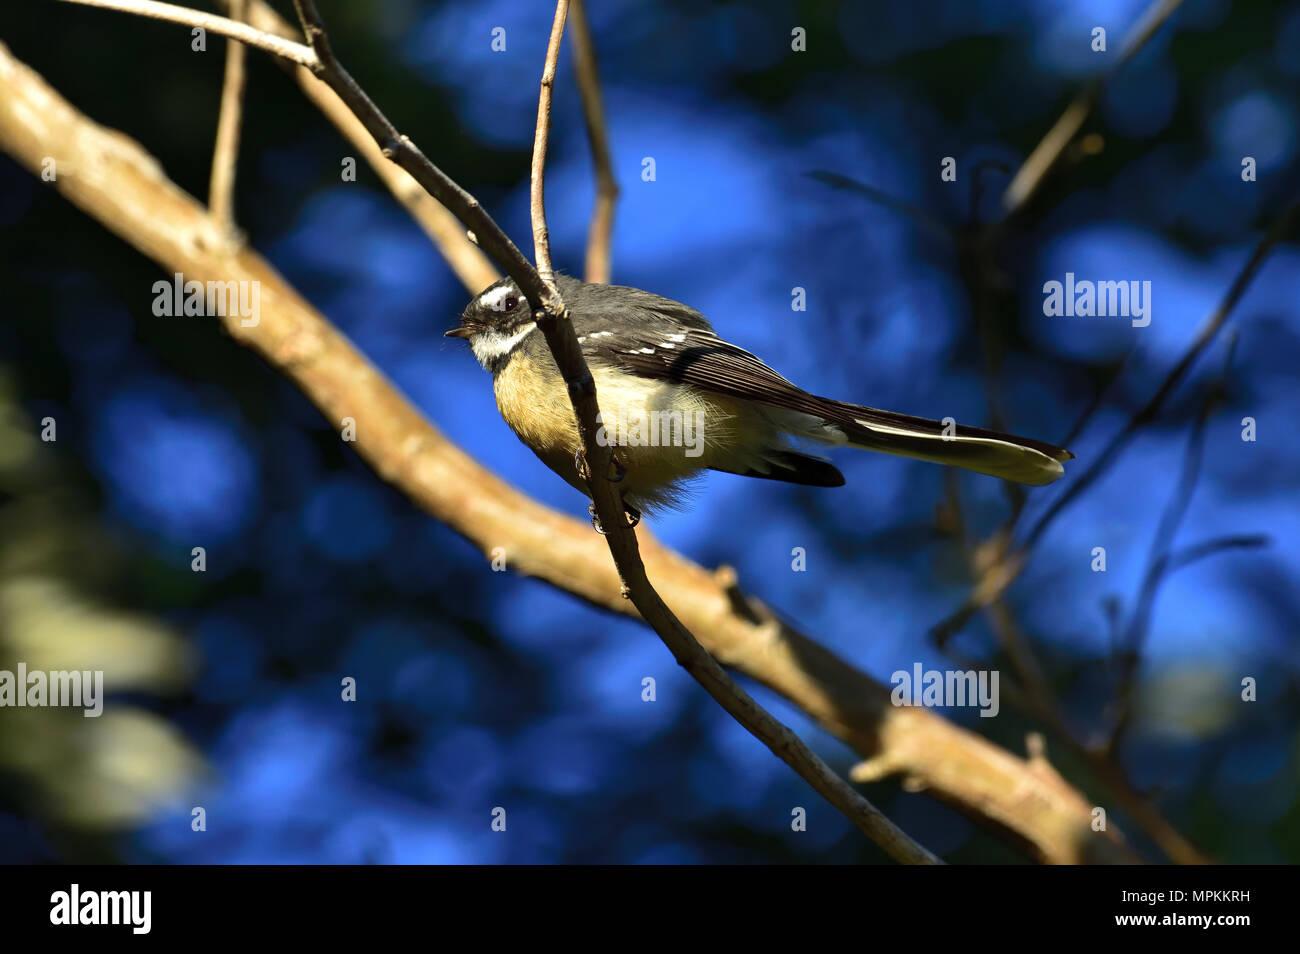 An Australian, Queensland Grey Fantail, Rhipidura fuliginosa resting on a Tree branch - Stock Image